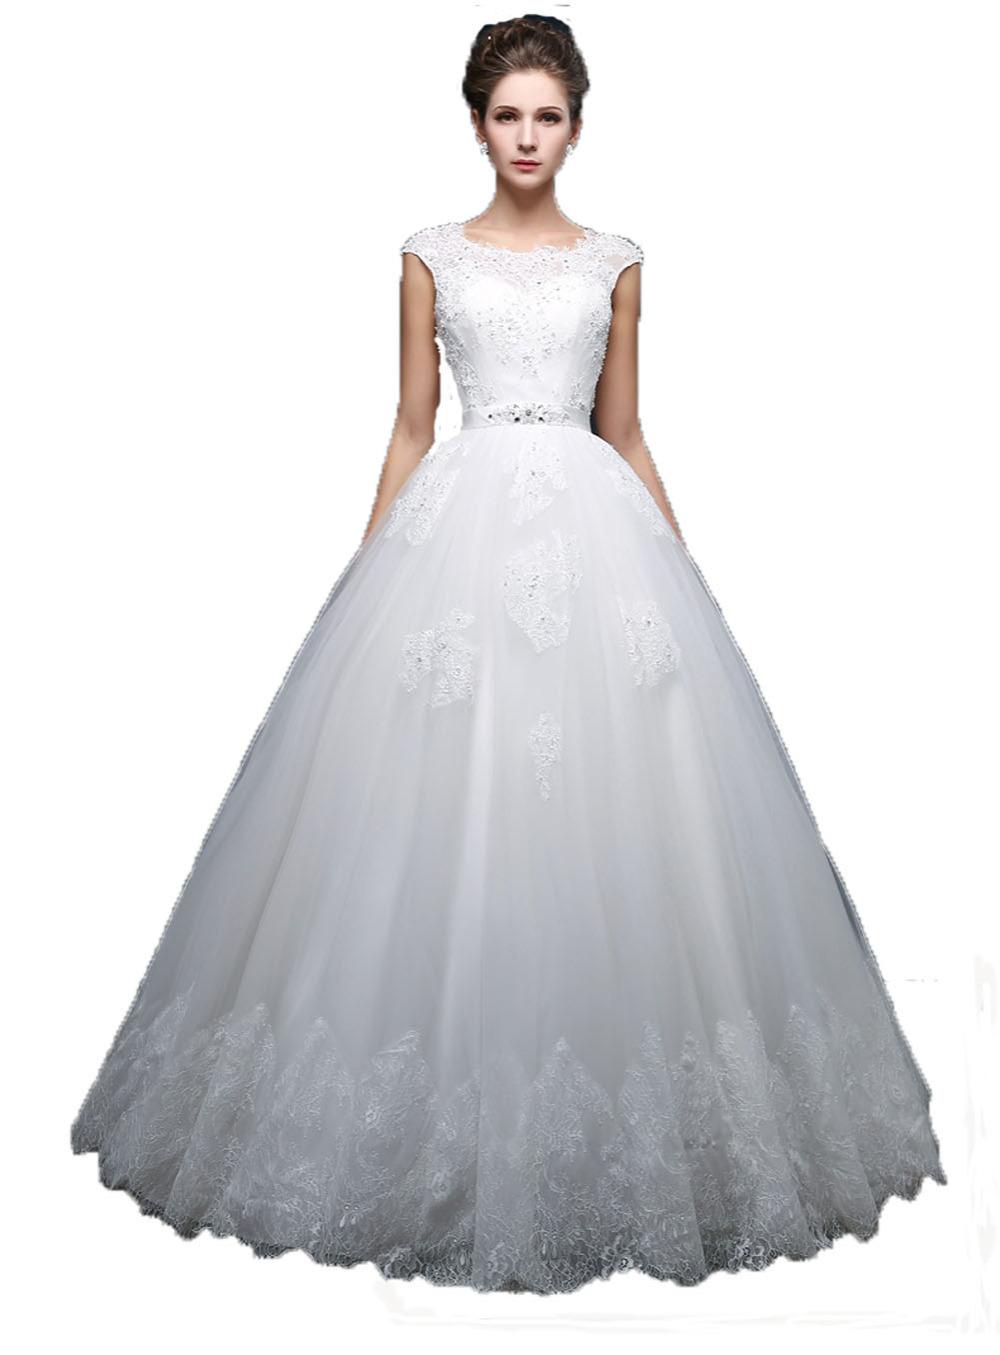 Hot Sale Ball Gown Wedding Dress Plus Size Vestidos De Noiva Summer Style  Robe De Mariage Wedding Dresses 2015 673f14bd5607